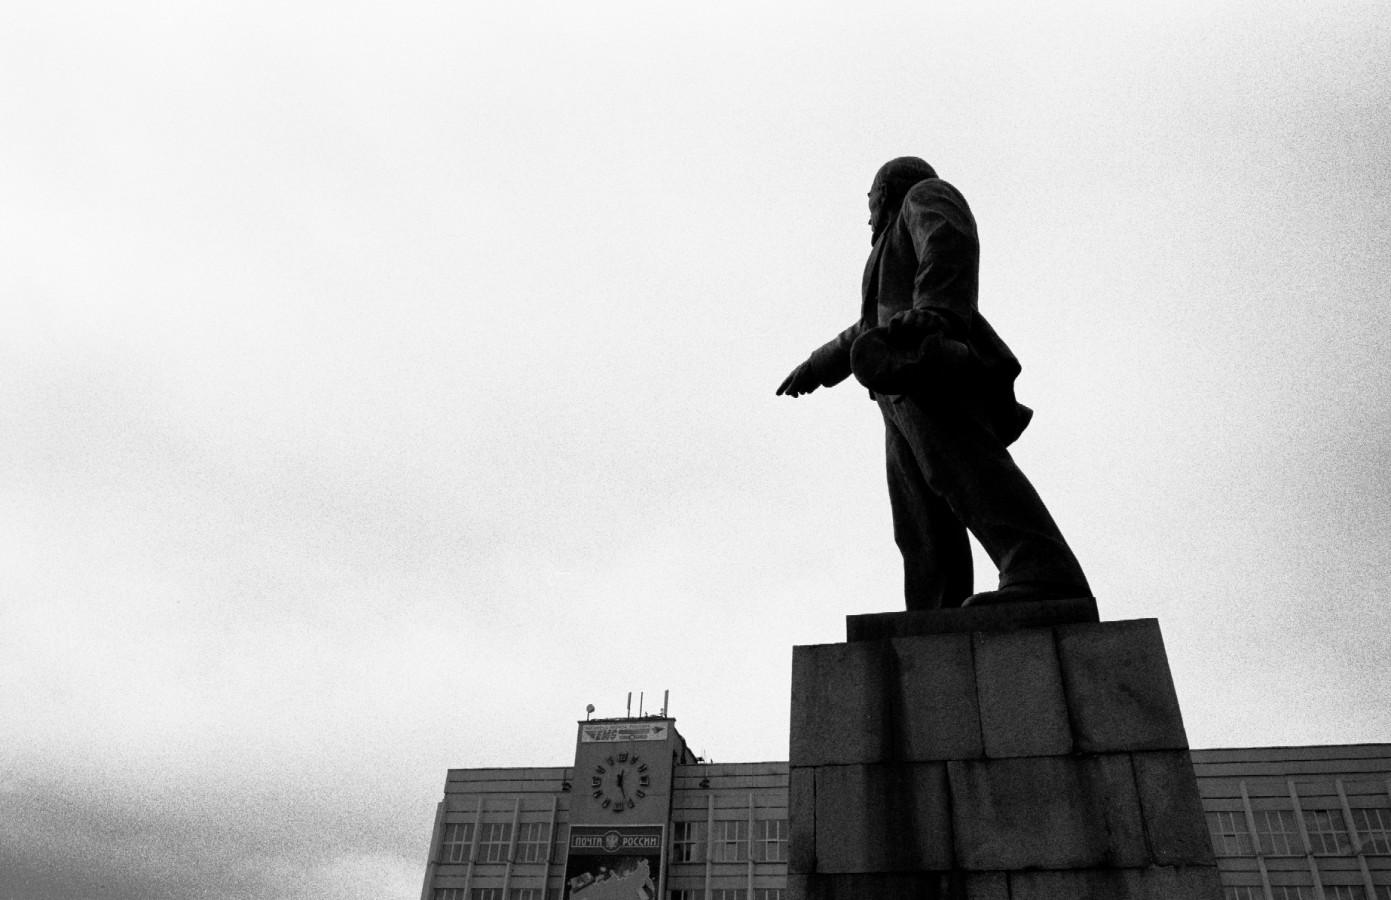 Lenin shows the way, Vladivostok